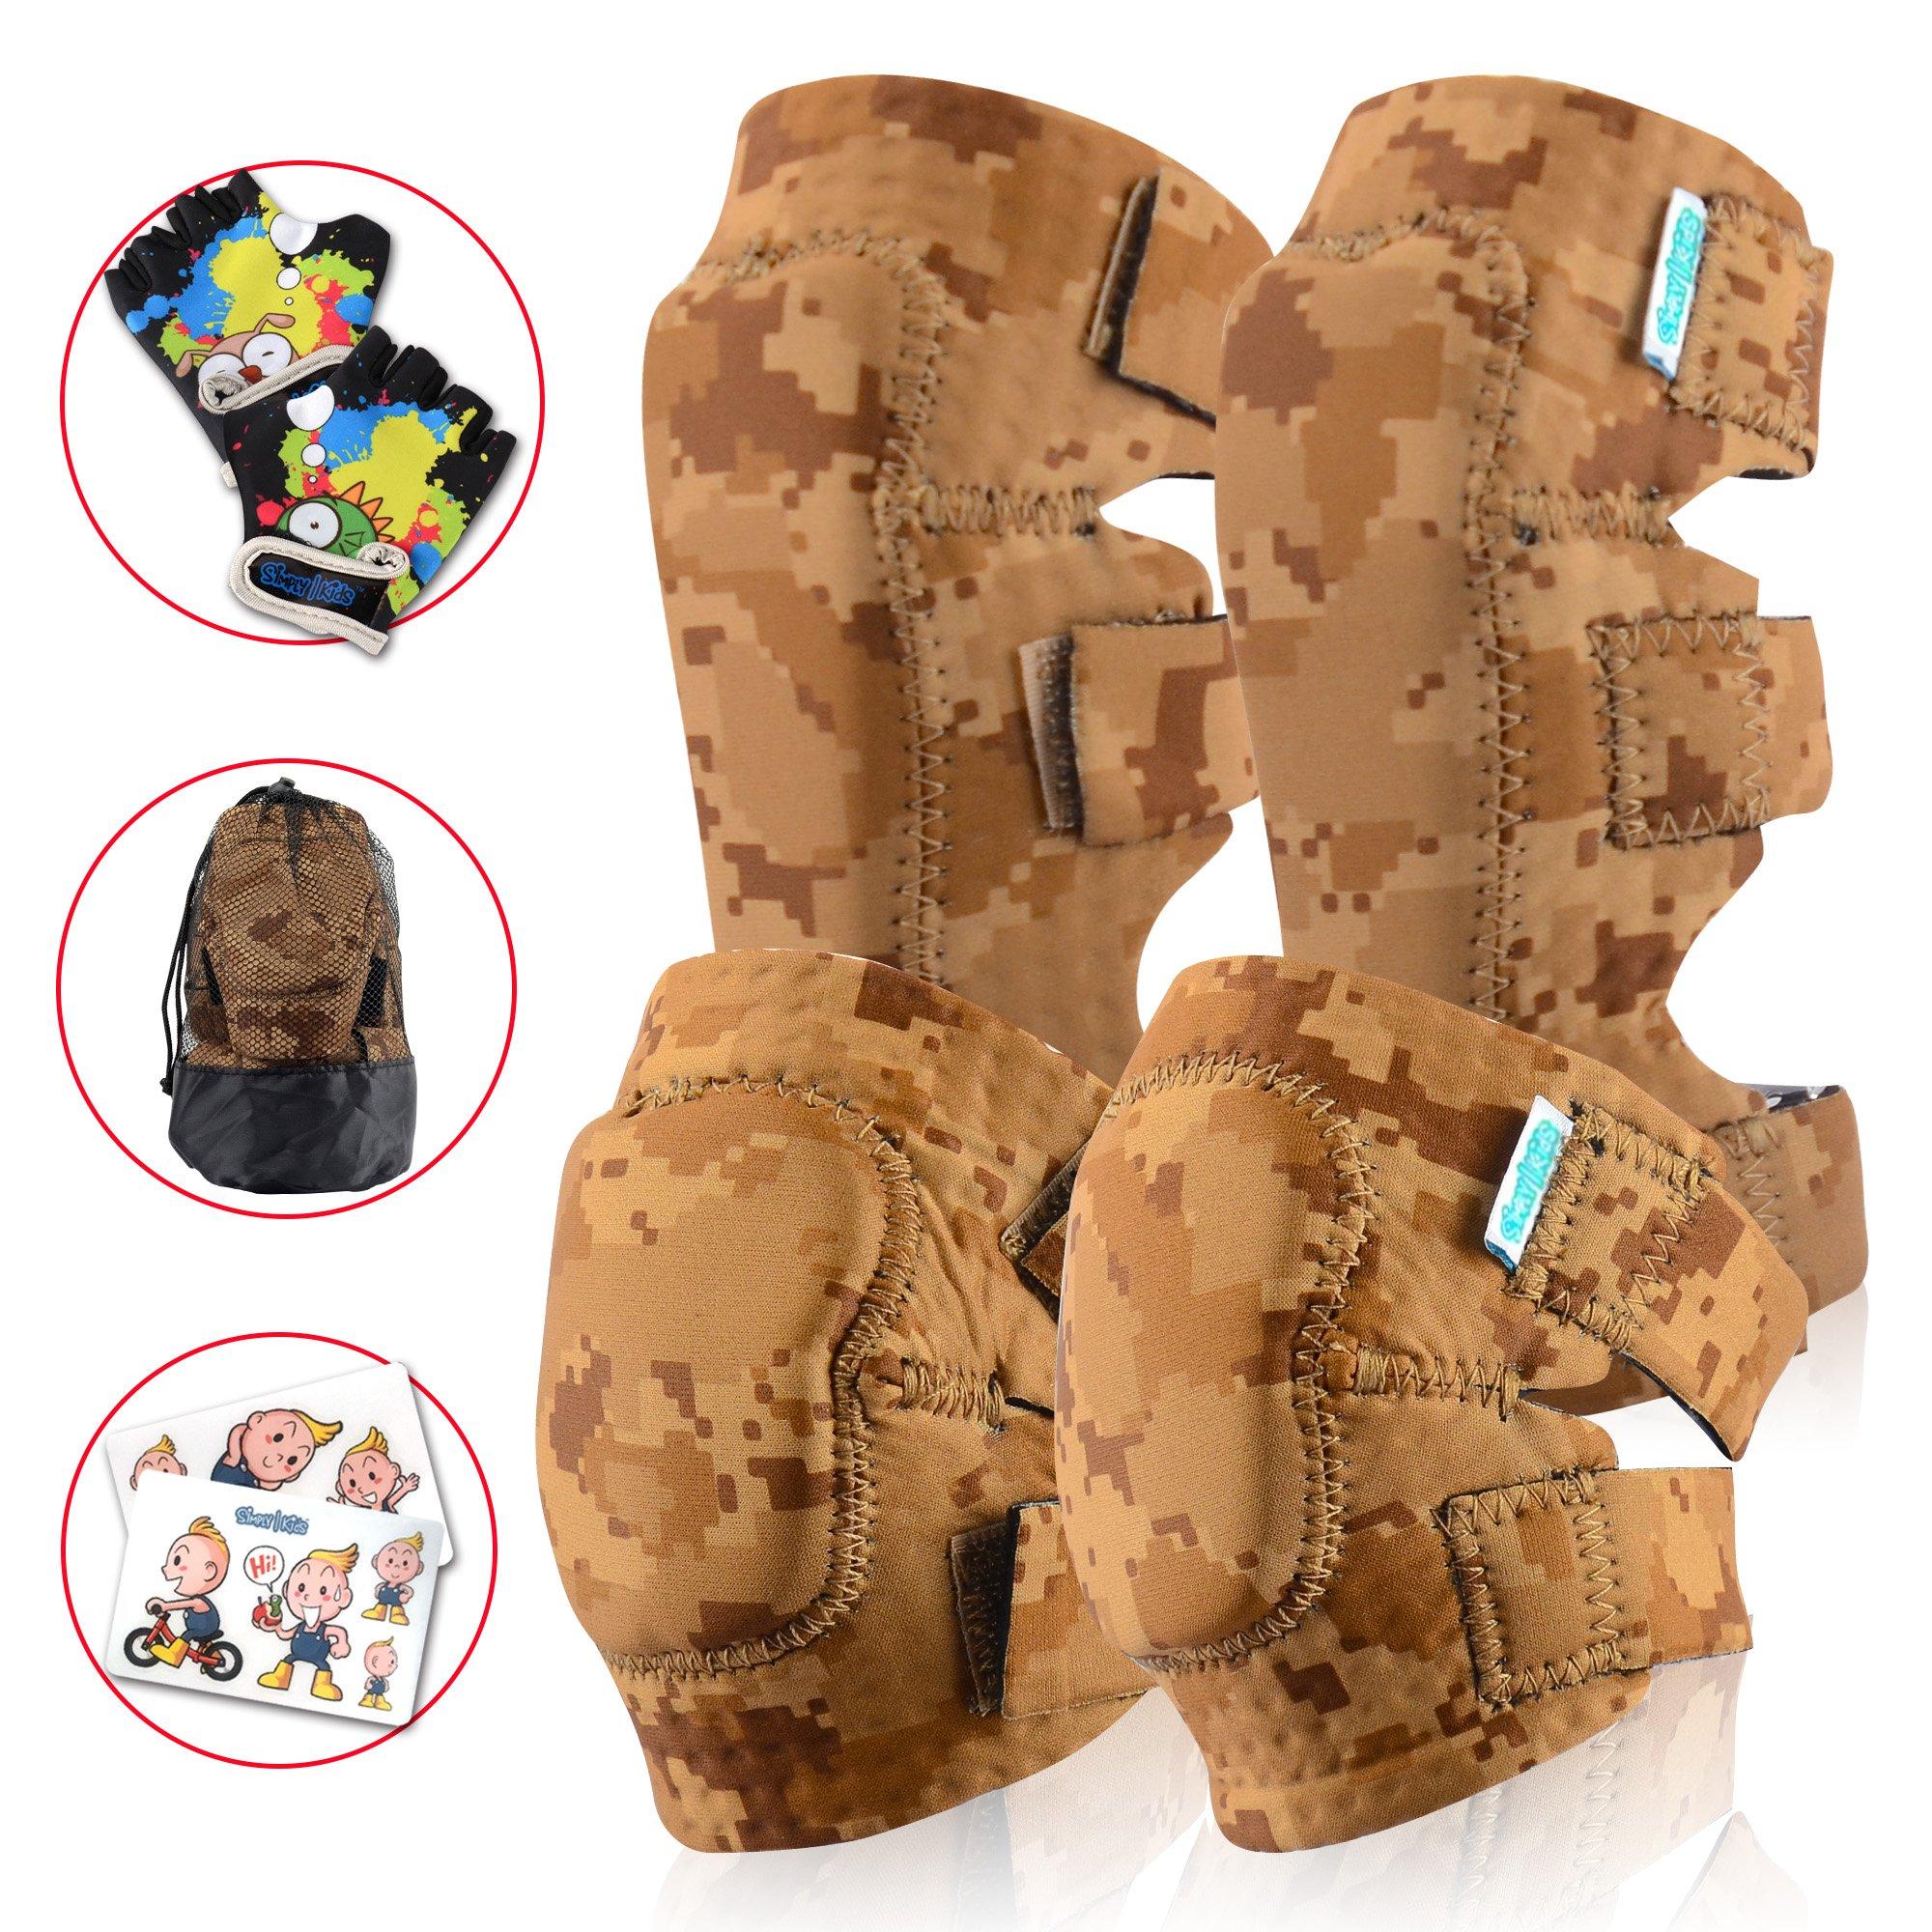 Innovative Soft Kids Knee And Elbow Pads Plus Bike Gloves | Toddler Protective Gear Set | Comfortable Breathable Safe | Roller-Skate, Skateboard, Rollerblade For Children Boy And Girl(Desert Camo)